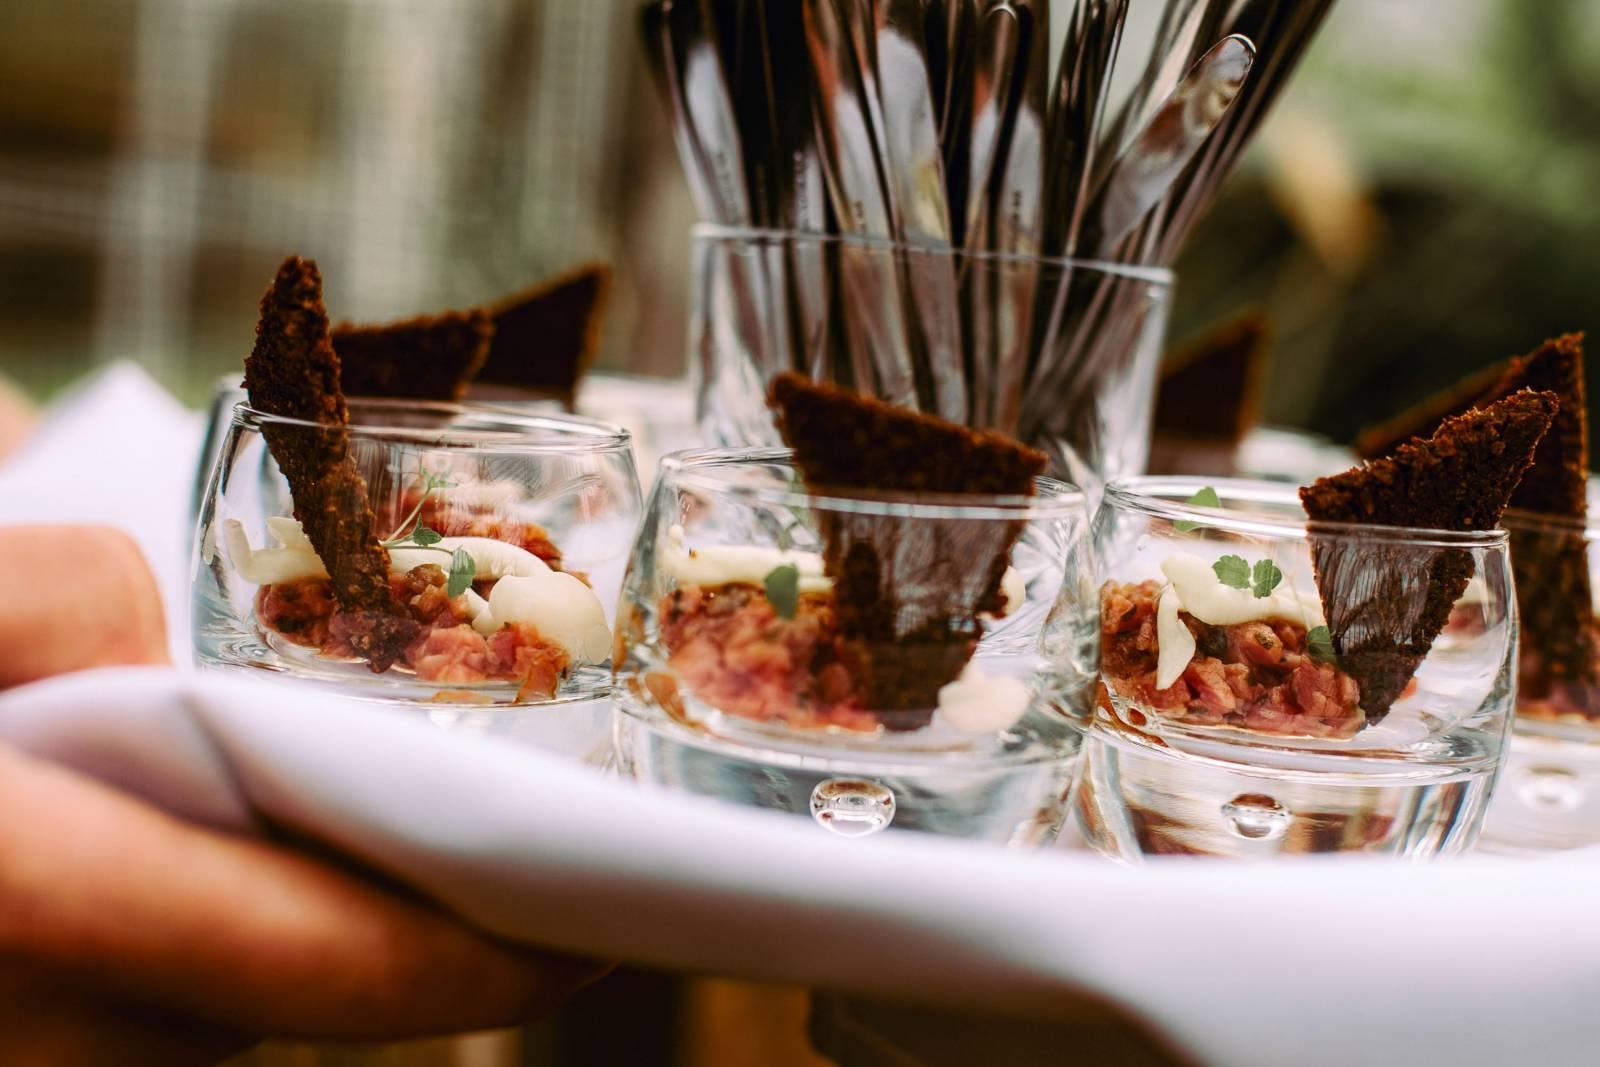 Insieme - Catering - Cateraar - Traiteur - House of Events - House of Weddings - 5